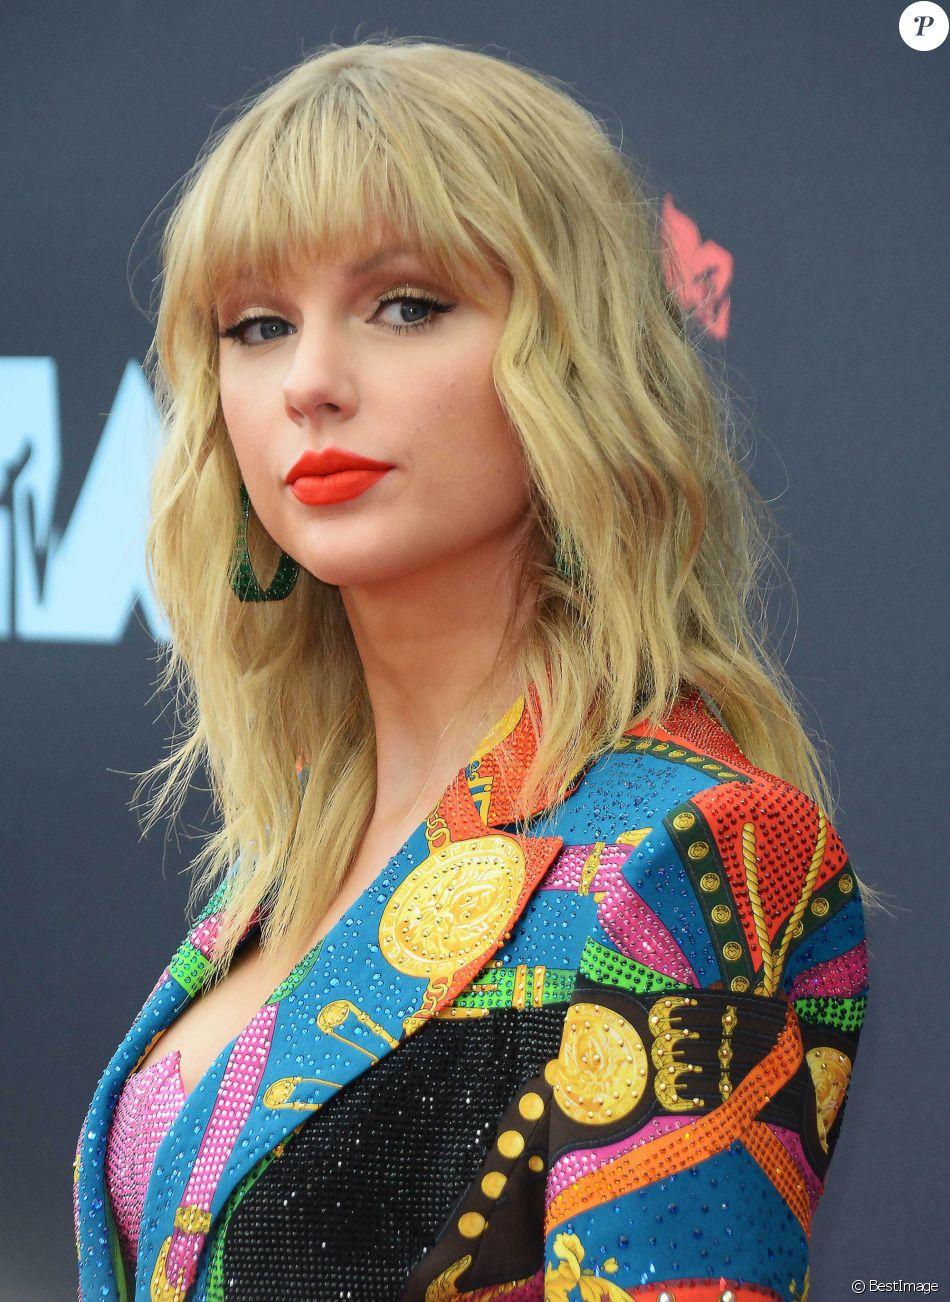 Taylor Swift au photocall des MTV video music awards au Prudential Center à Newark le 26 août 2019.